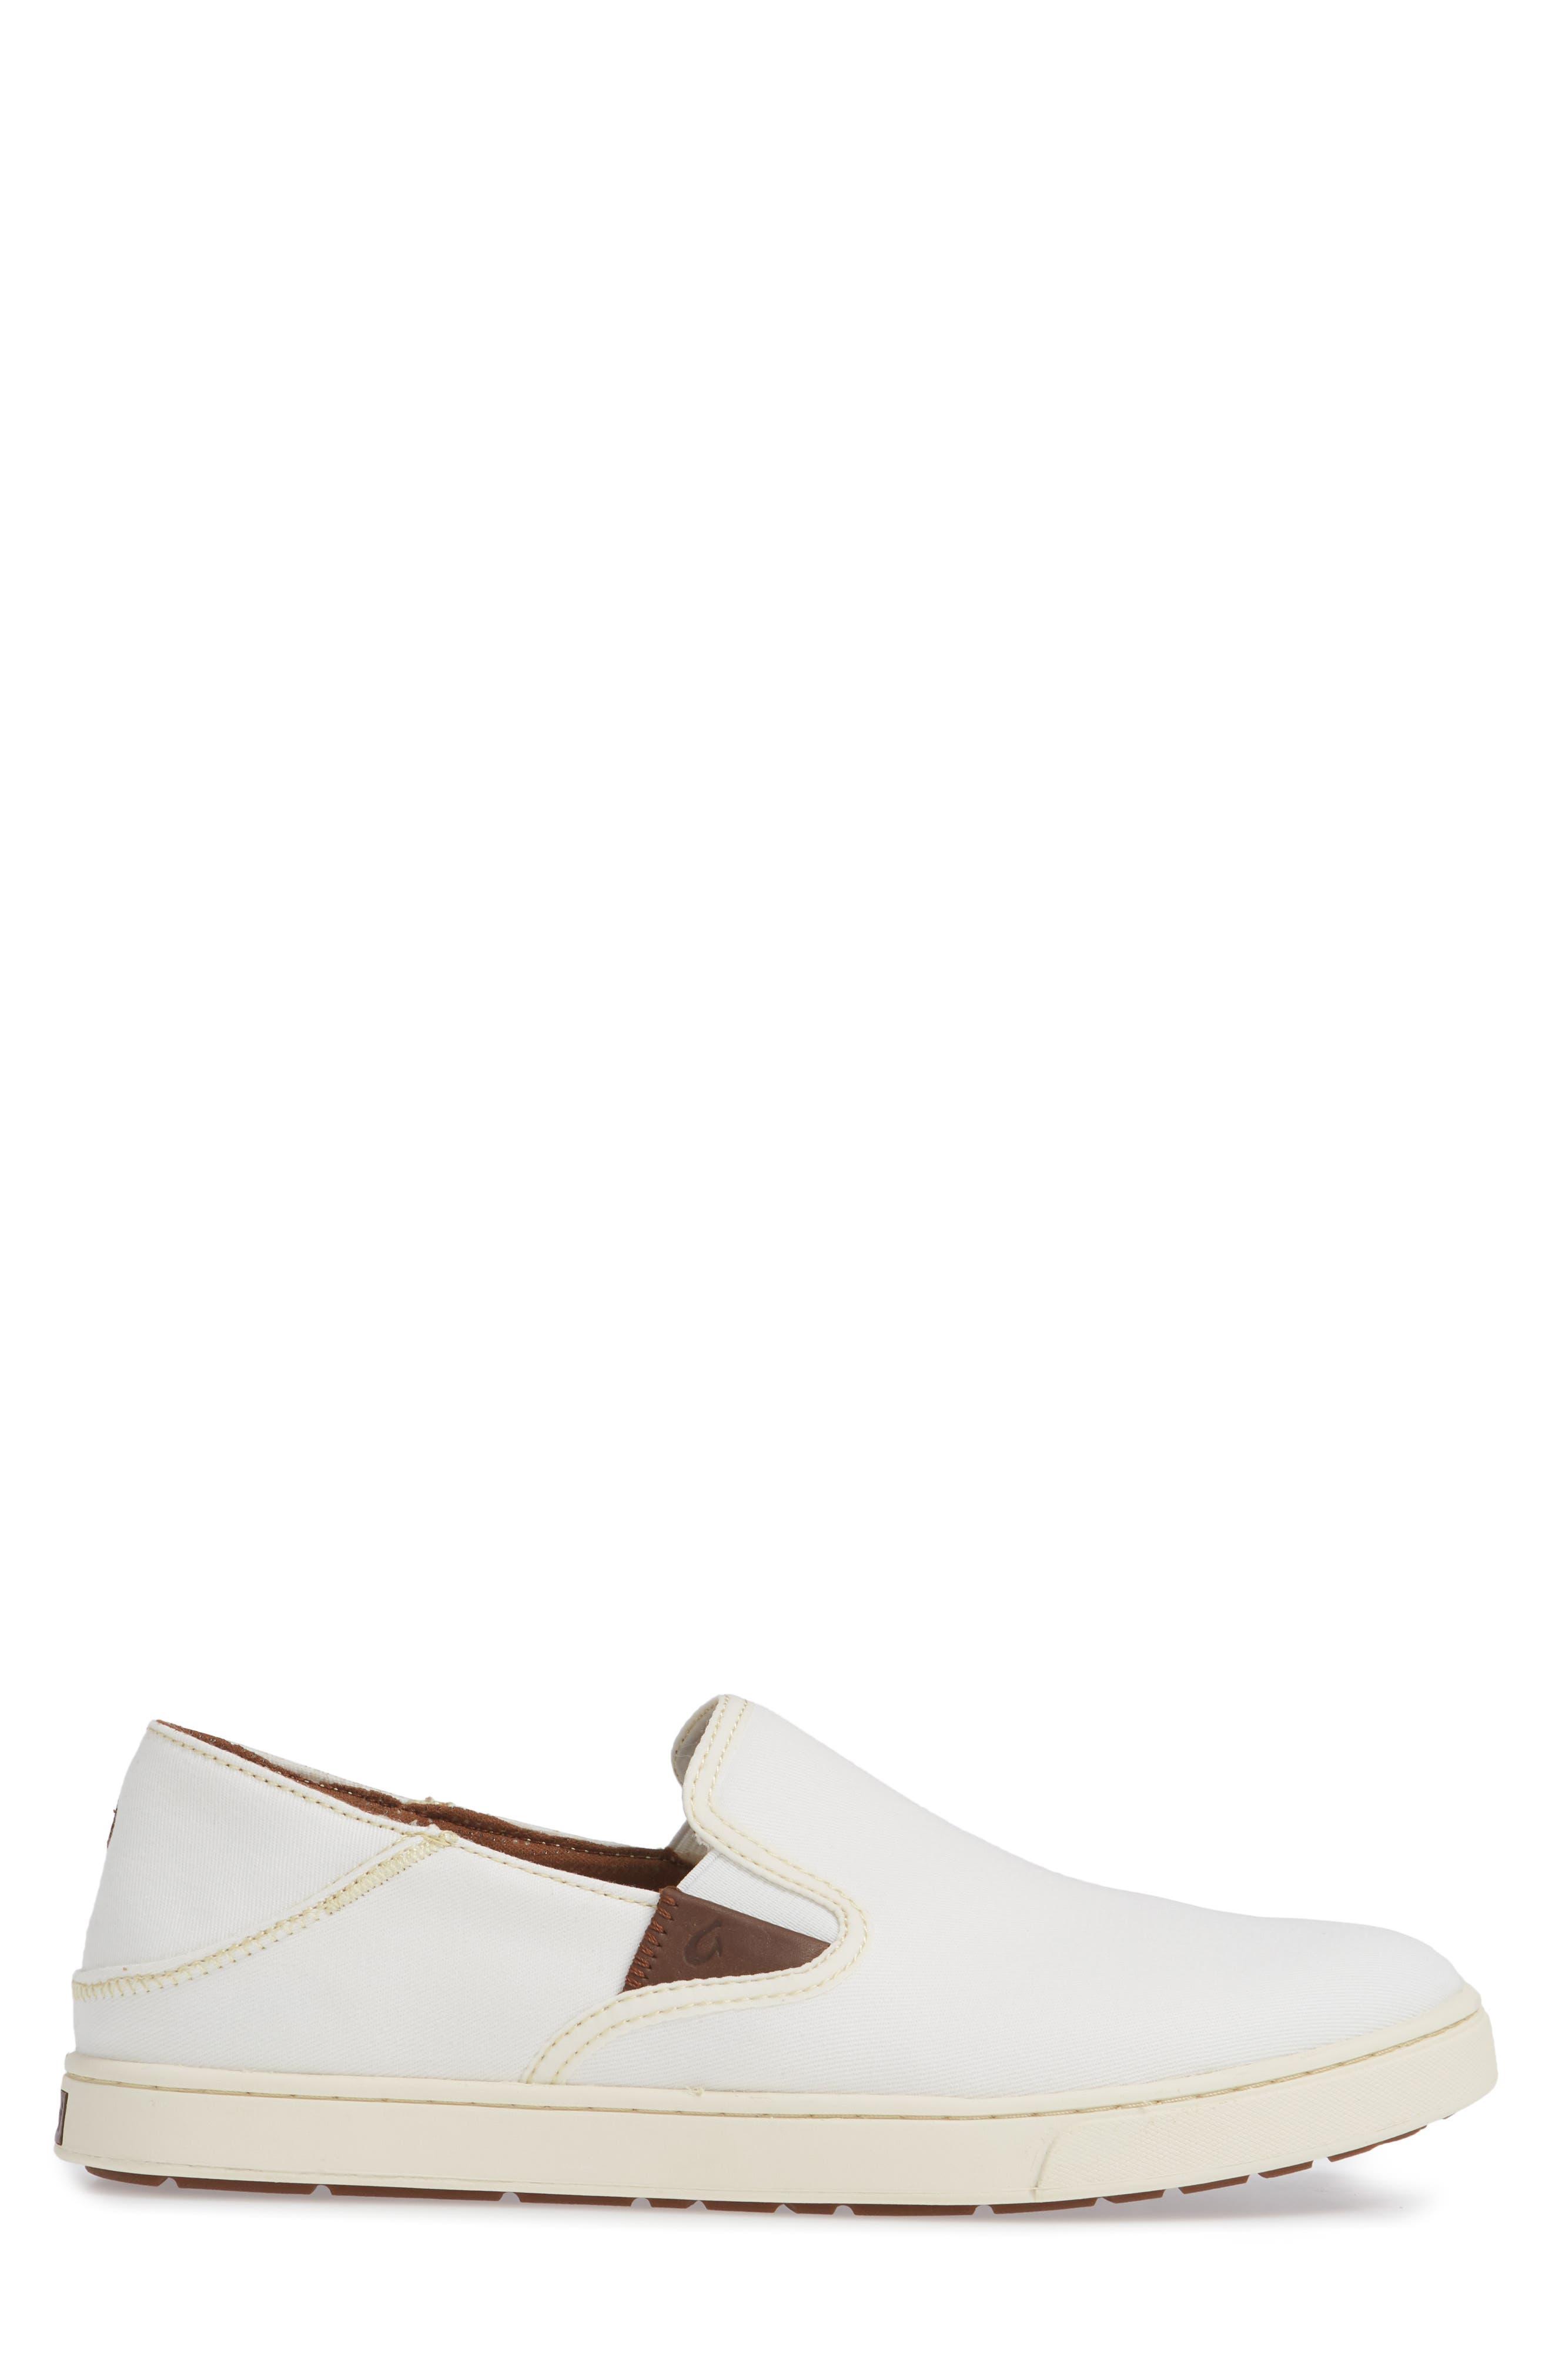 Kahu Collapsible Slip-On Sneaker,                             Alternate thumbnail 3, color,                             259